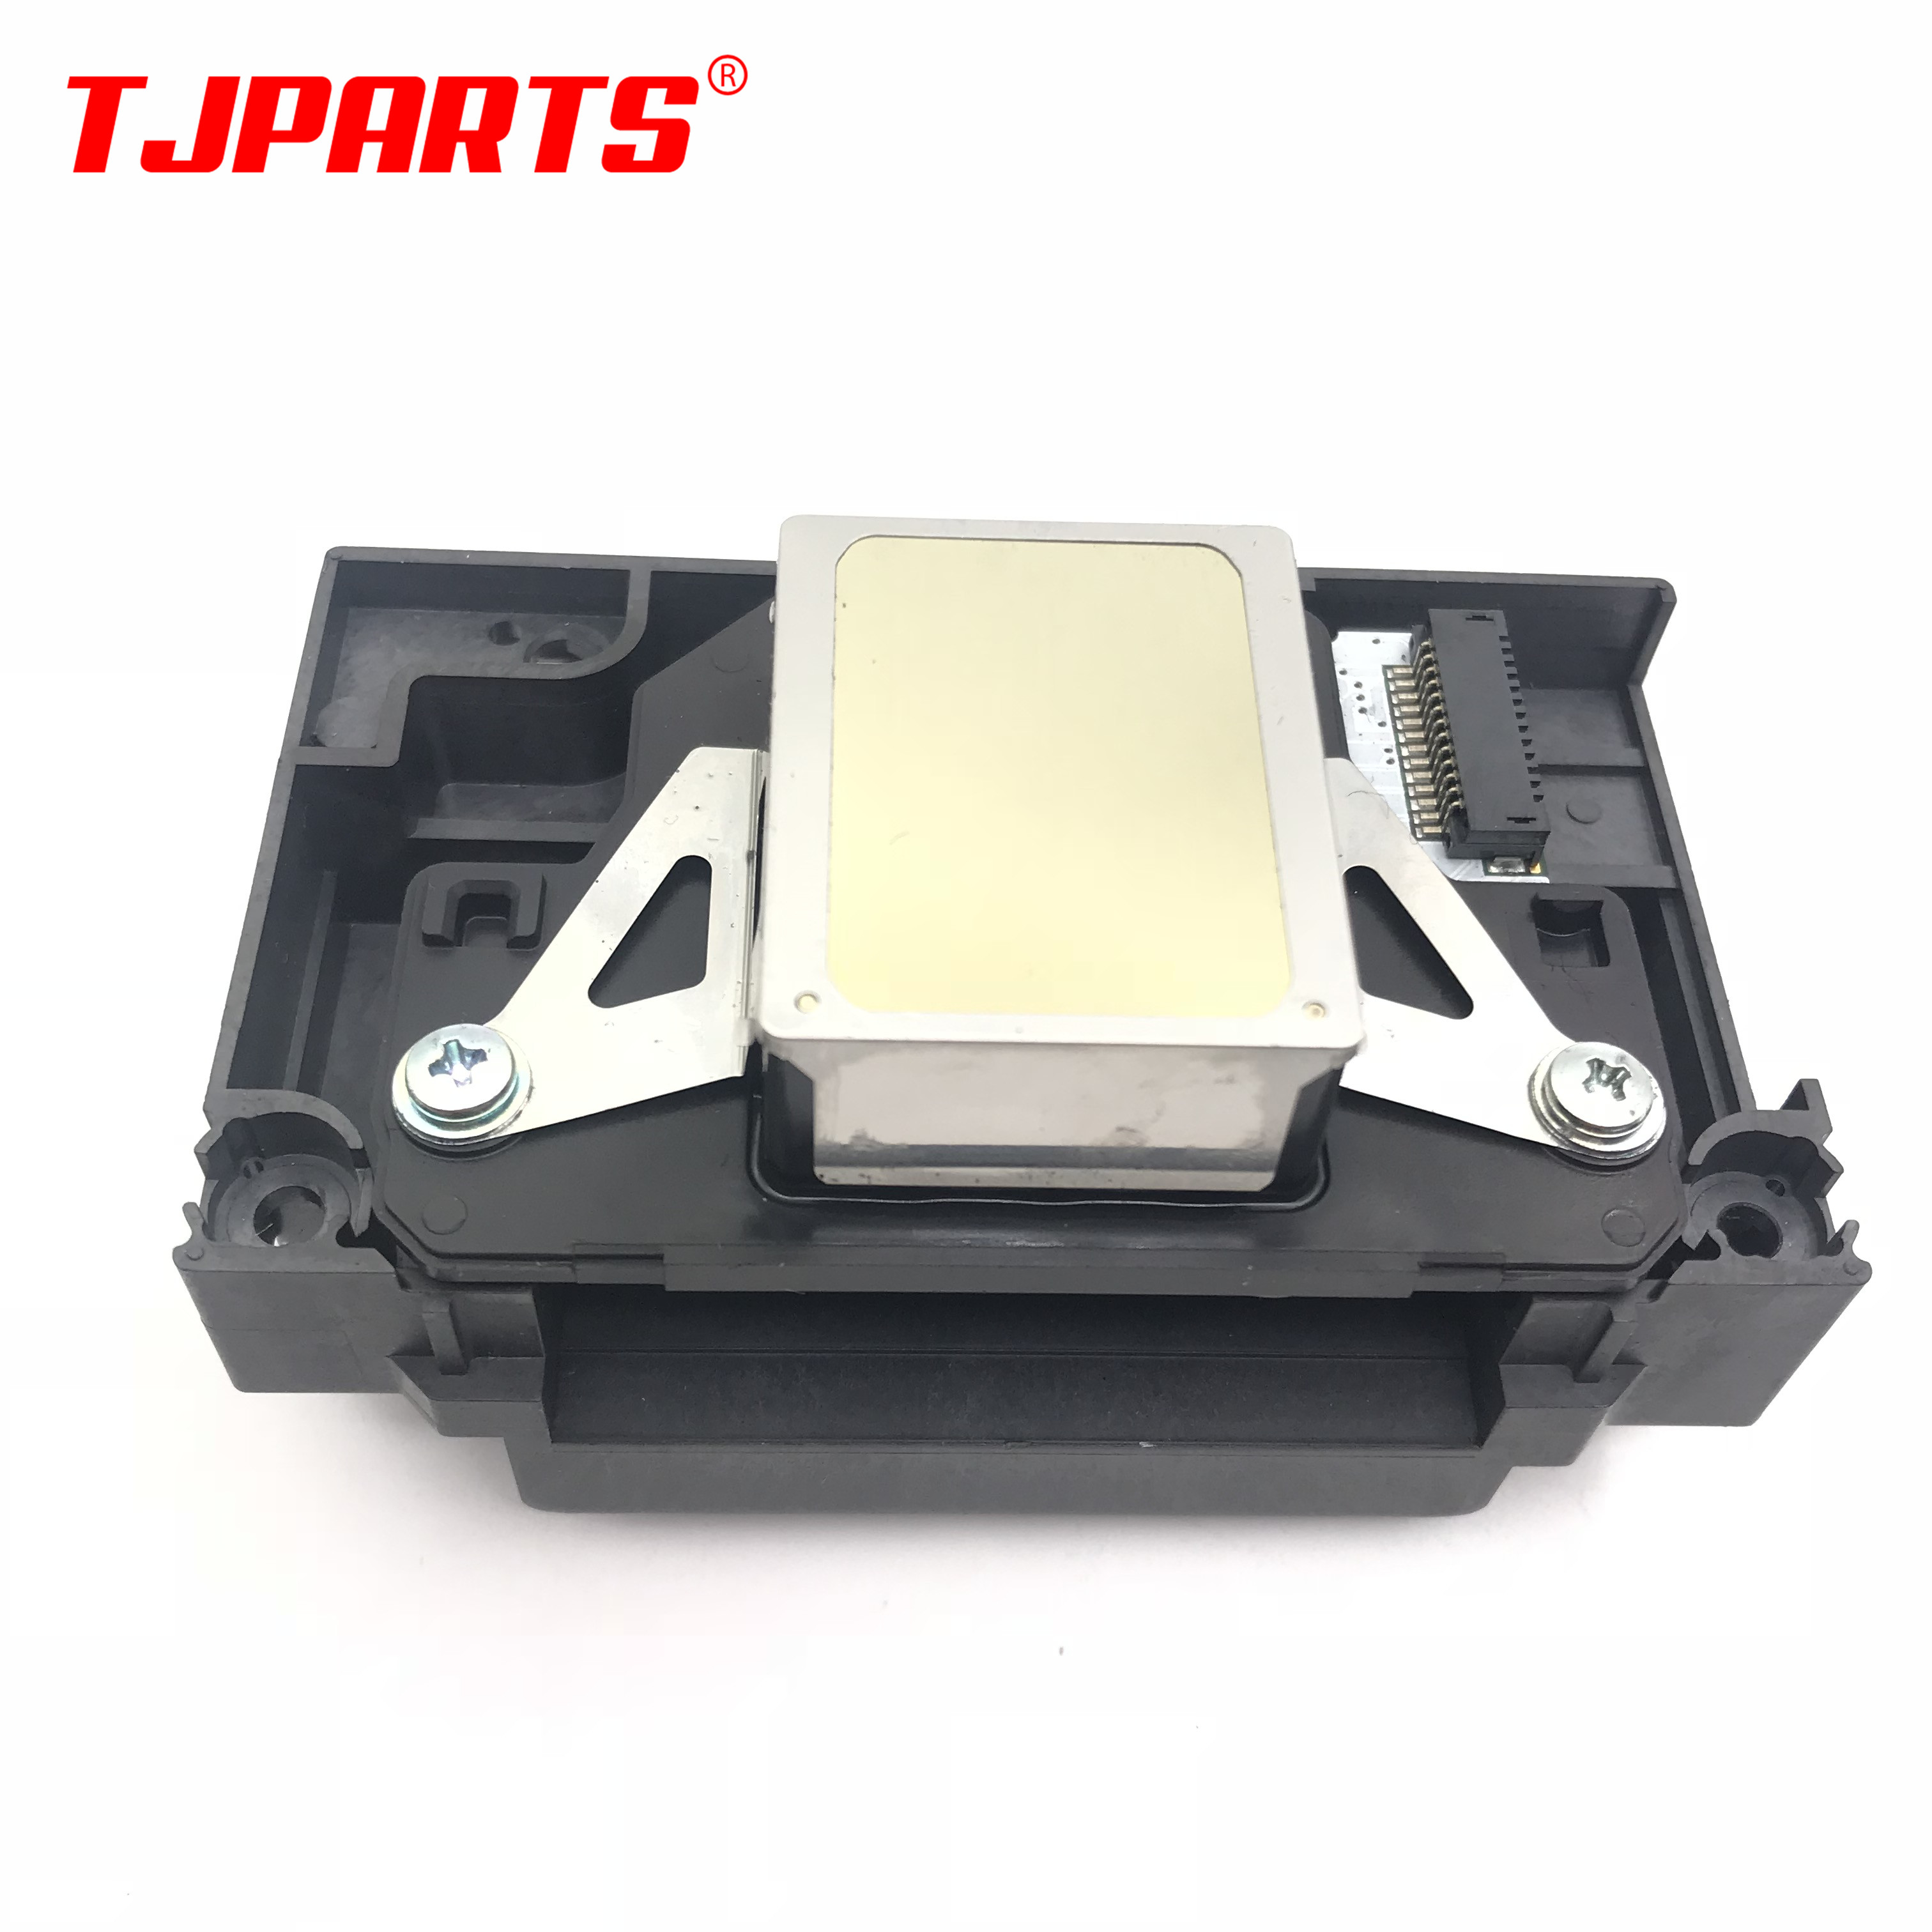 NEW F180000 Printhead Print Head for Epson R280 R285 R290 R295 R330 RX610 RX690 PX660 PX610 P50 P60 T50 T60 T59 TX650 L800 L801